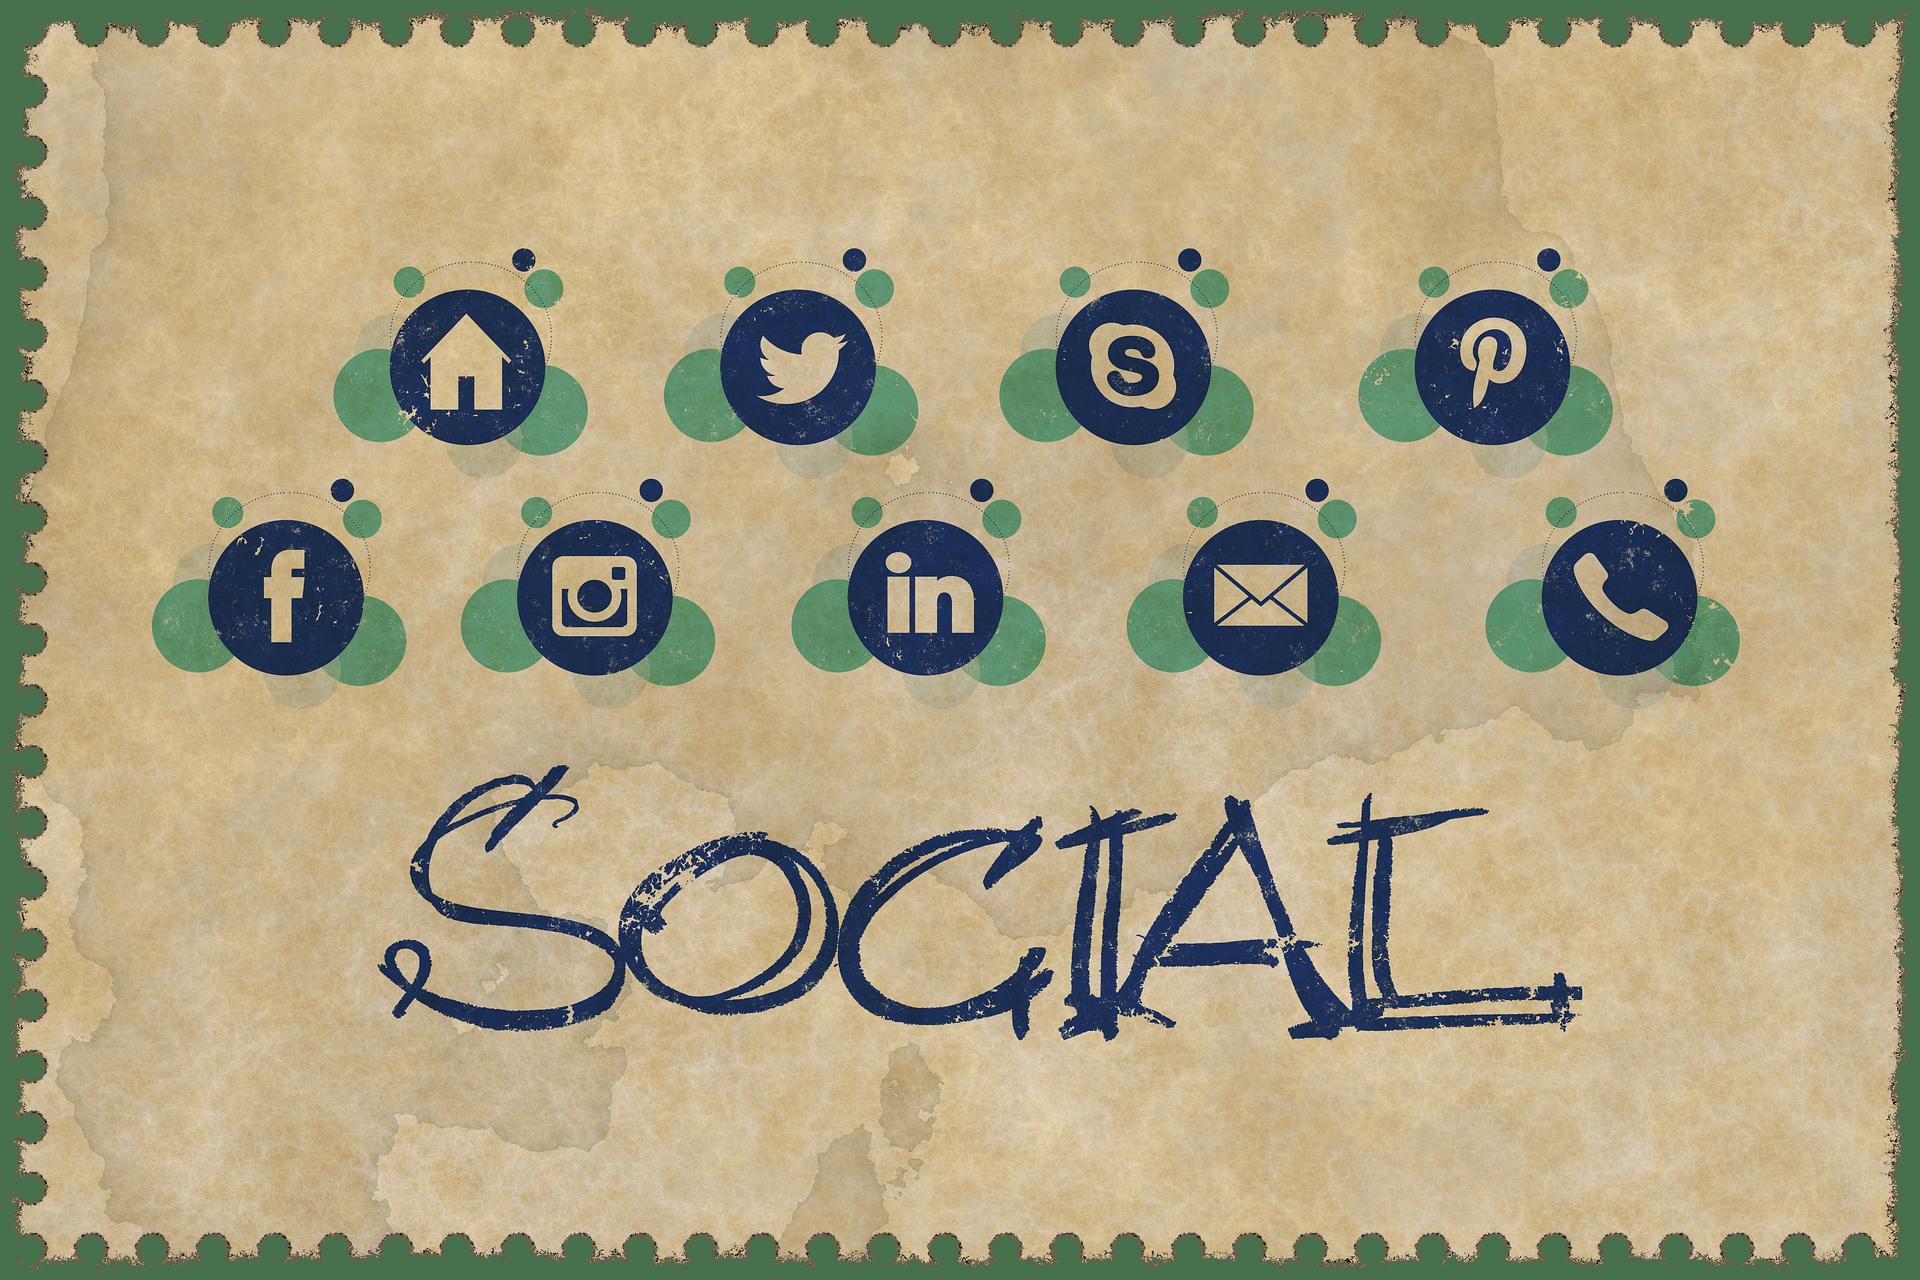 https://hockliffepc.org.uk/social-media-policy/